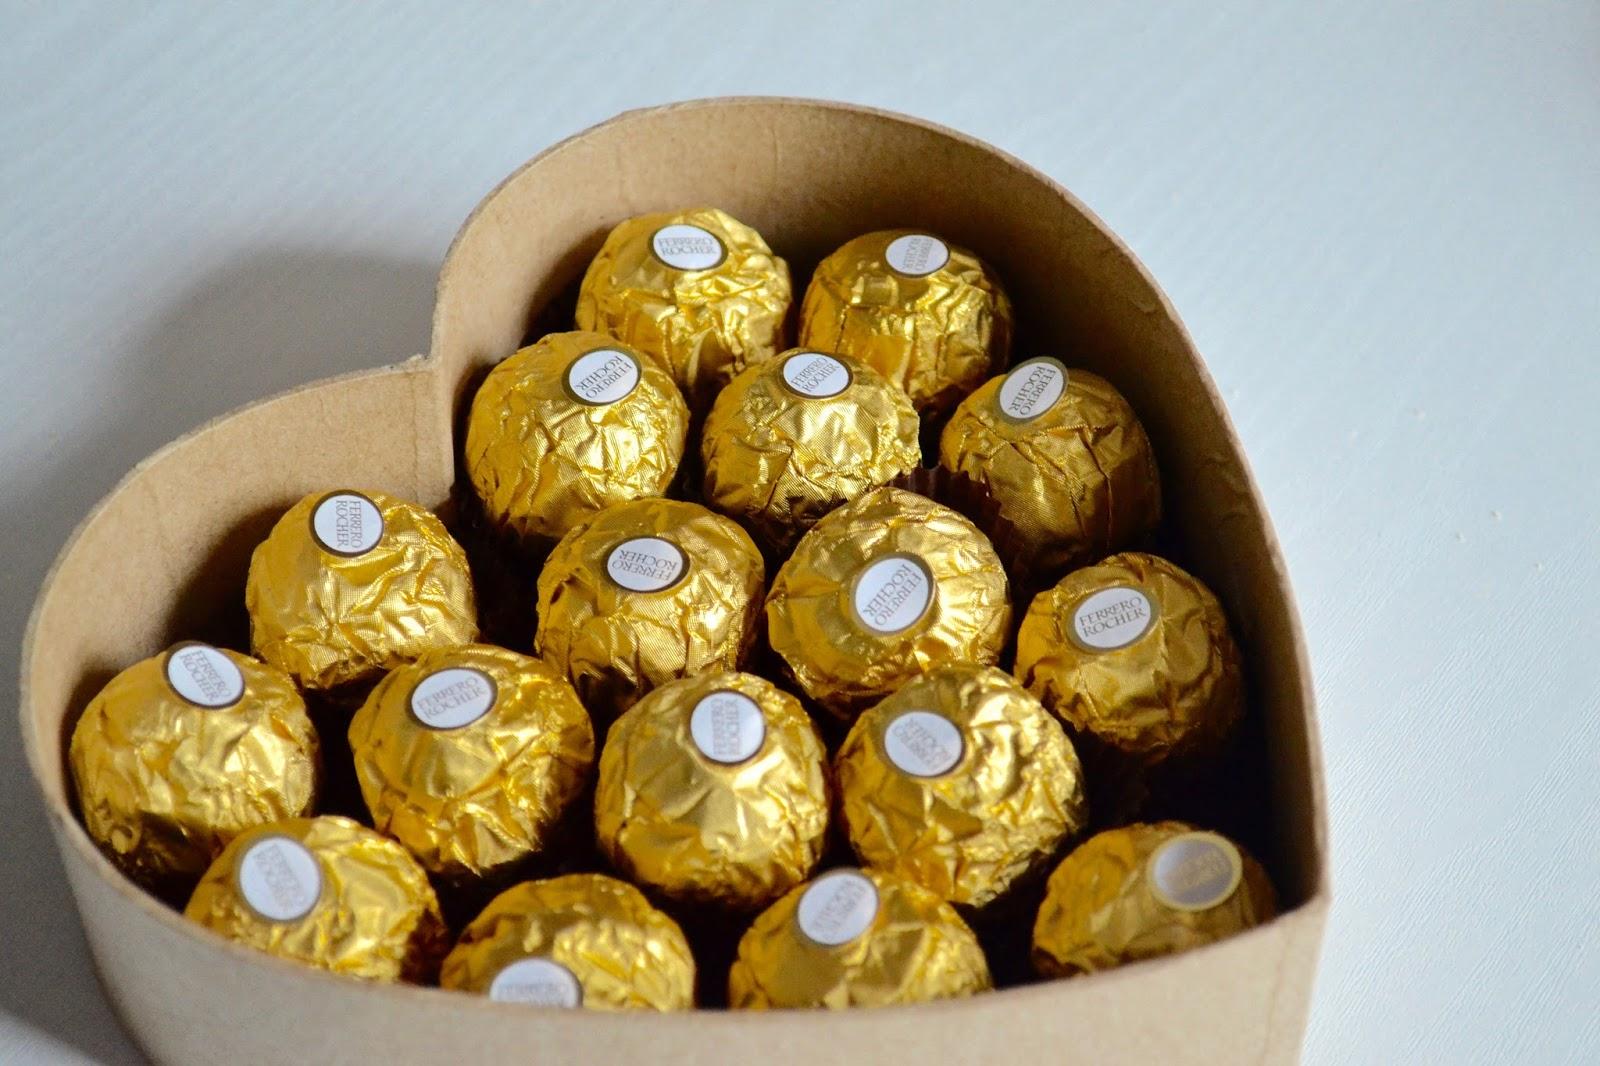 Diy Gift Chocolate Box The Things She Makes